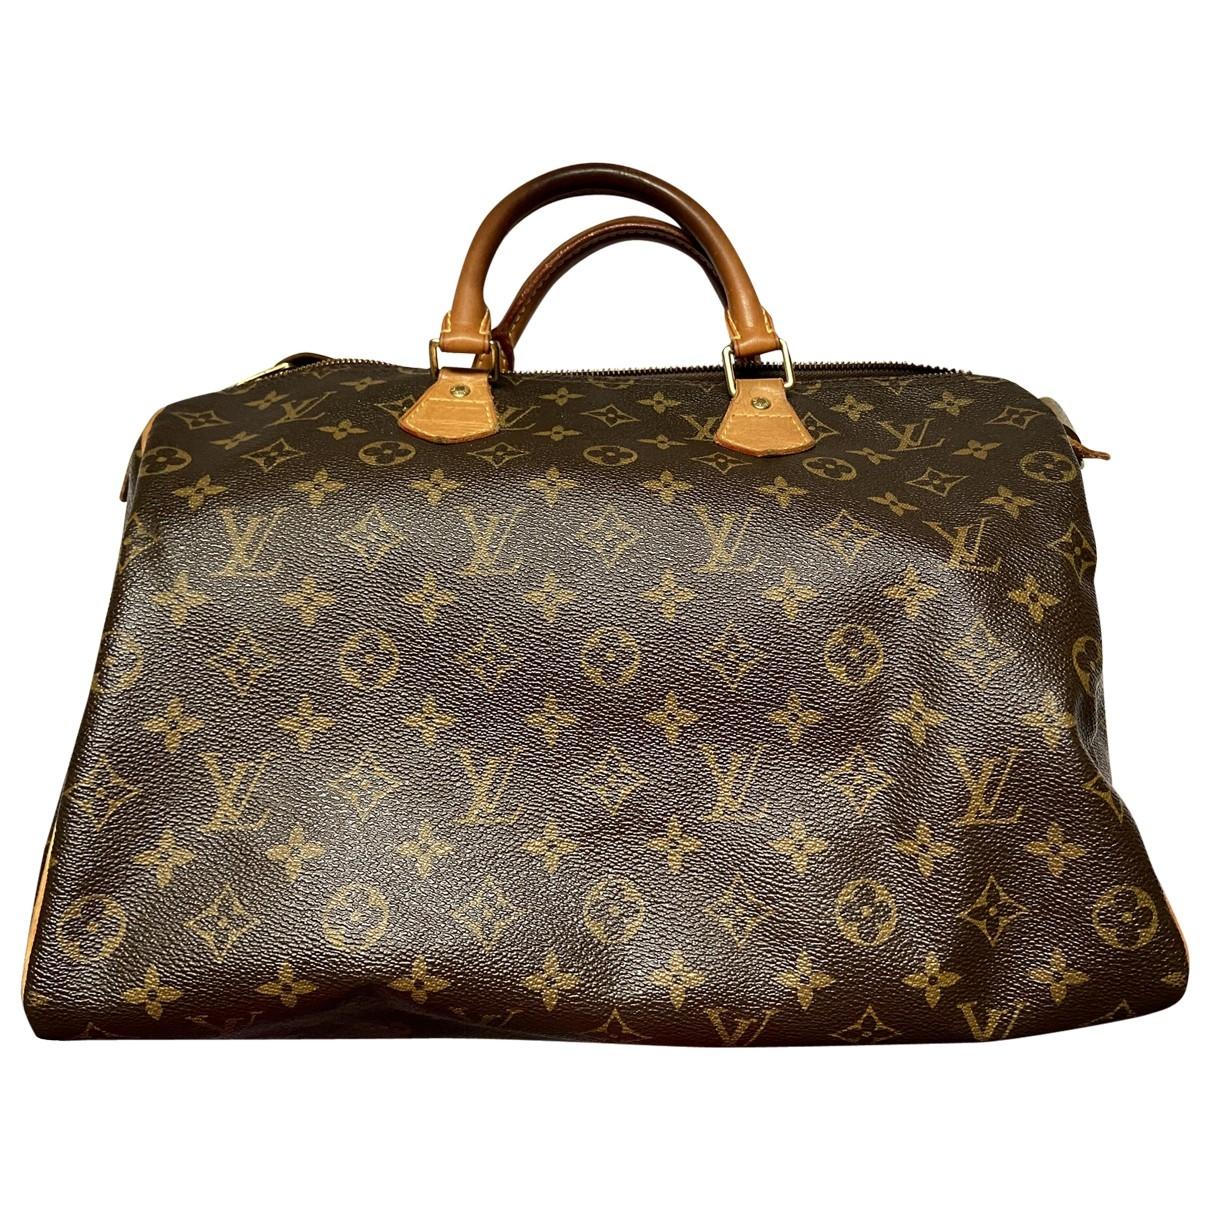 Louis Vuitton - Sac a main Speedy pour femme en toile - marron